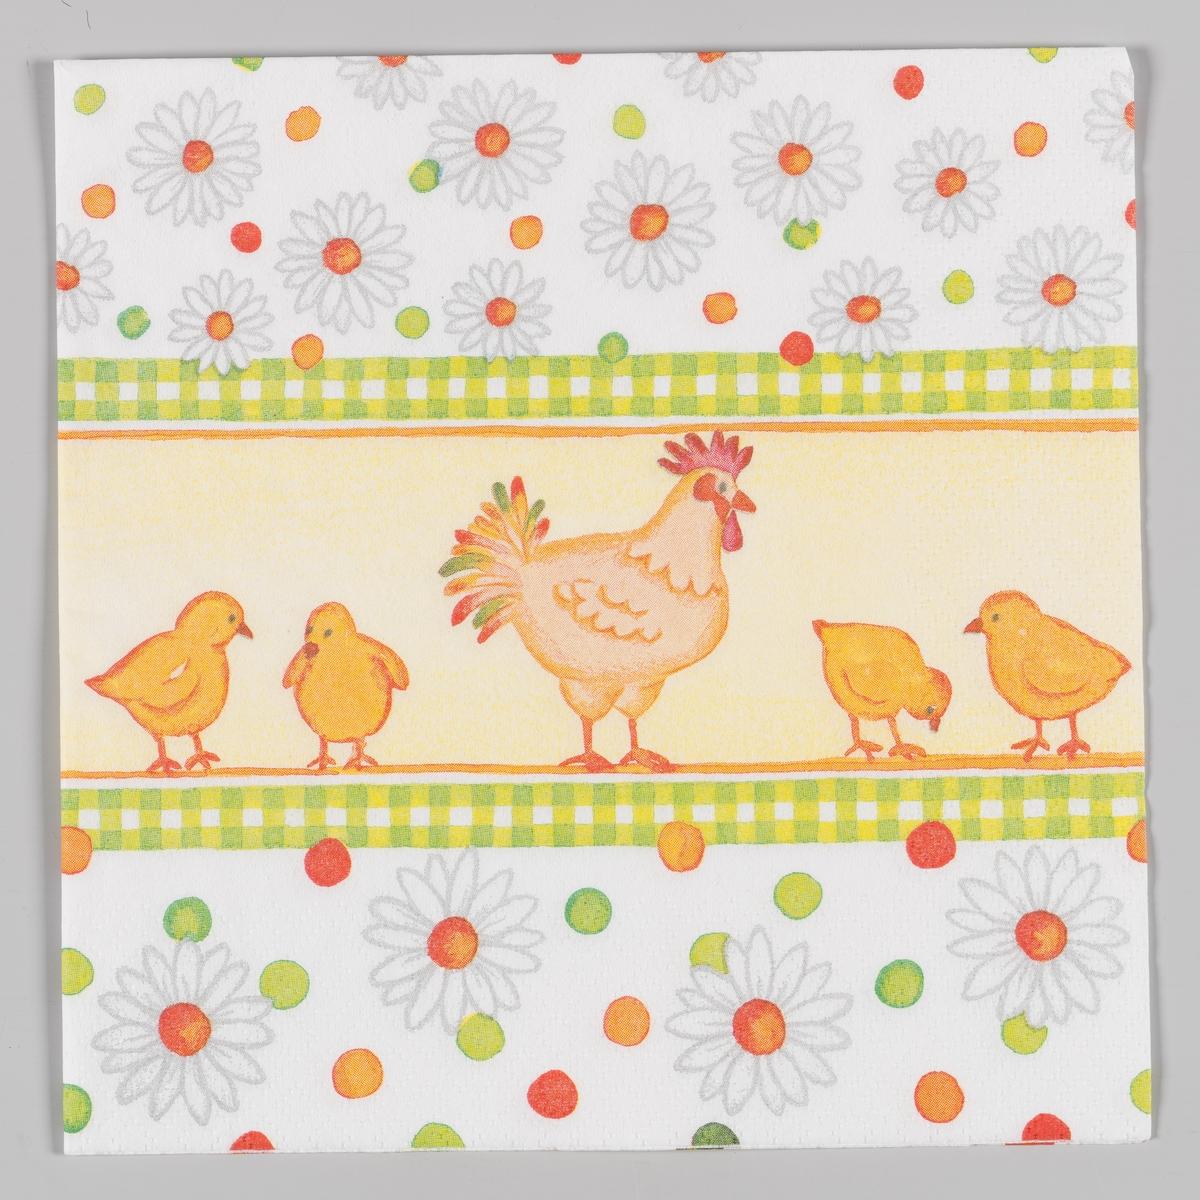 En hønemor sammen med fire kyllinger. To grønne og hvitrutete striper. Hvite blomster og røde, grønne og oransje prikker.